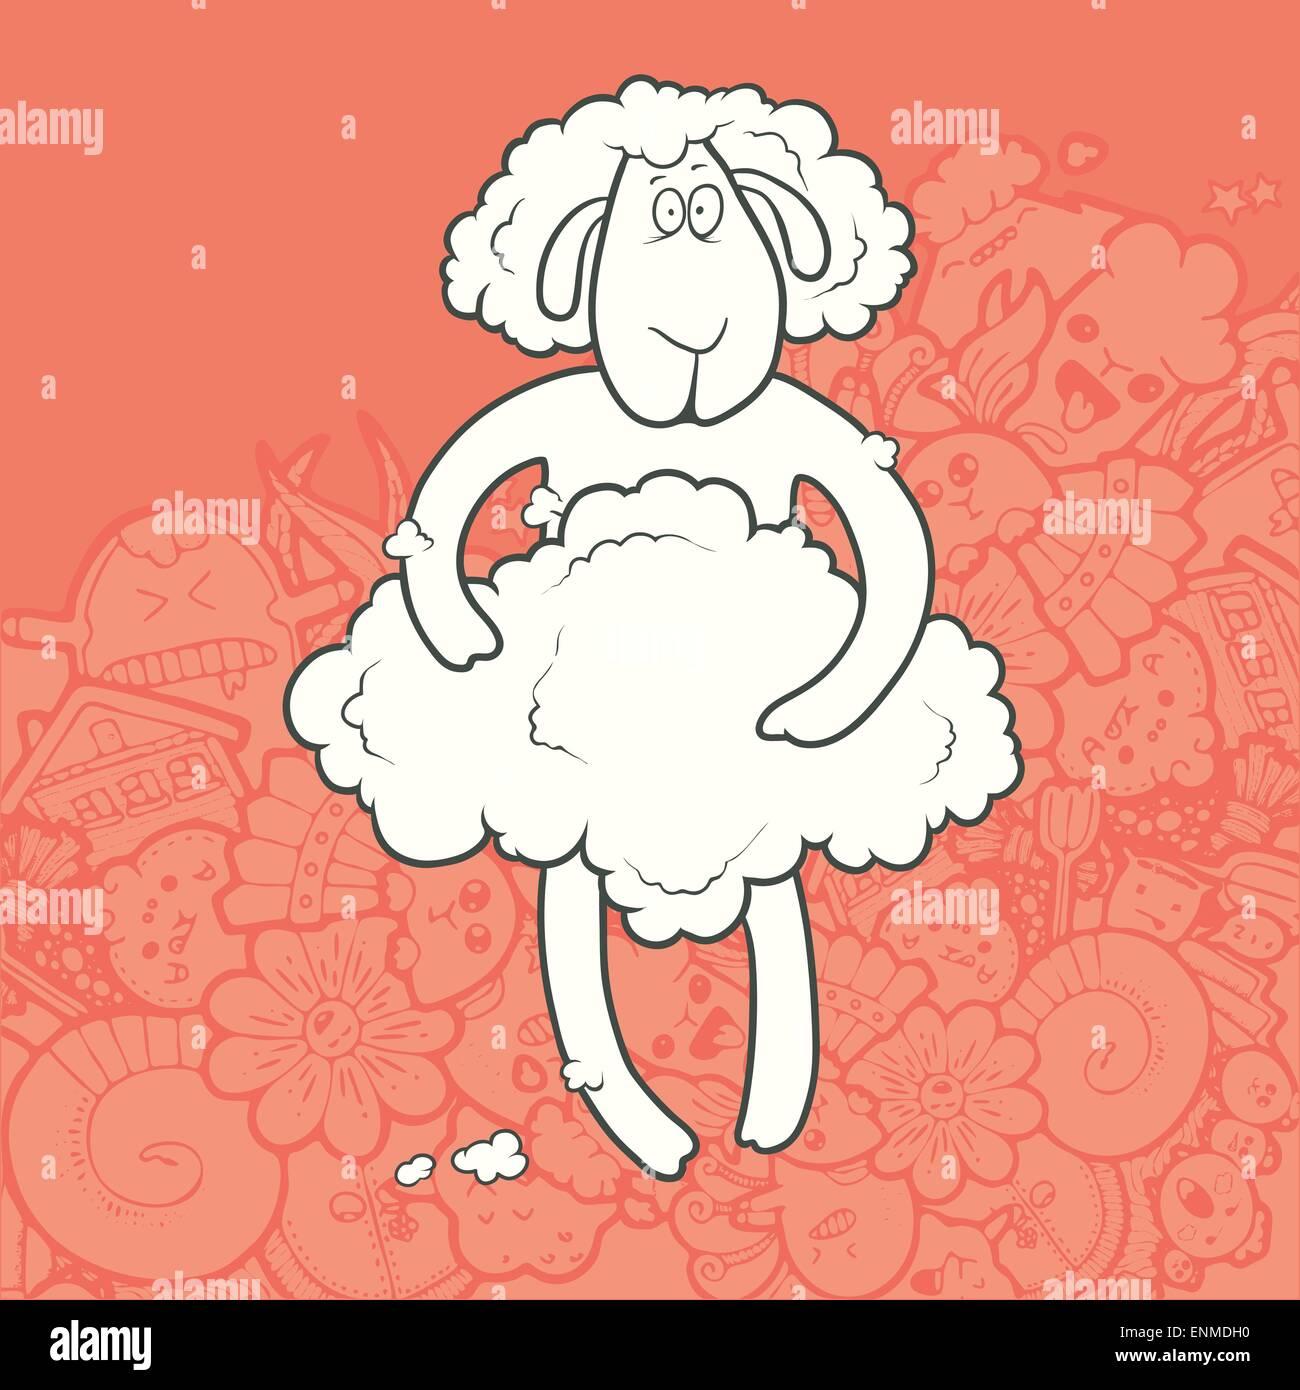 Vektor Illustration niedlichen Hand Drawn rasiert Lamm hält sein Fell. Grußkarte Neujahr. Das Konzept Stockbild